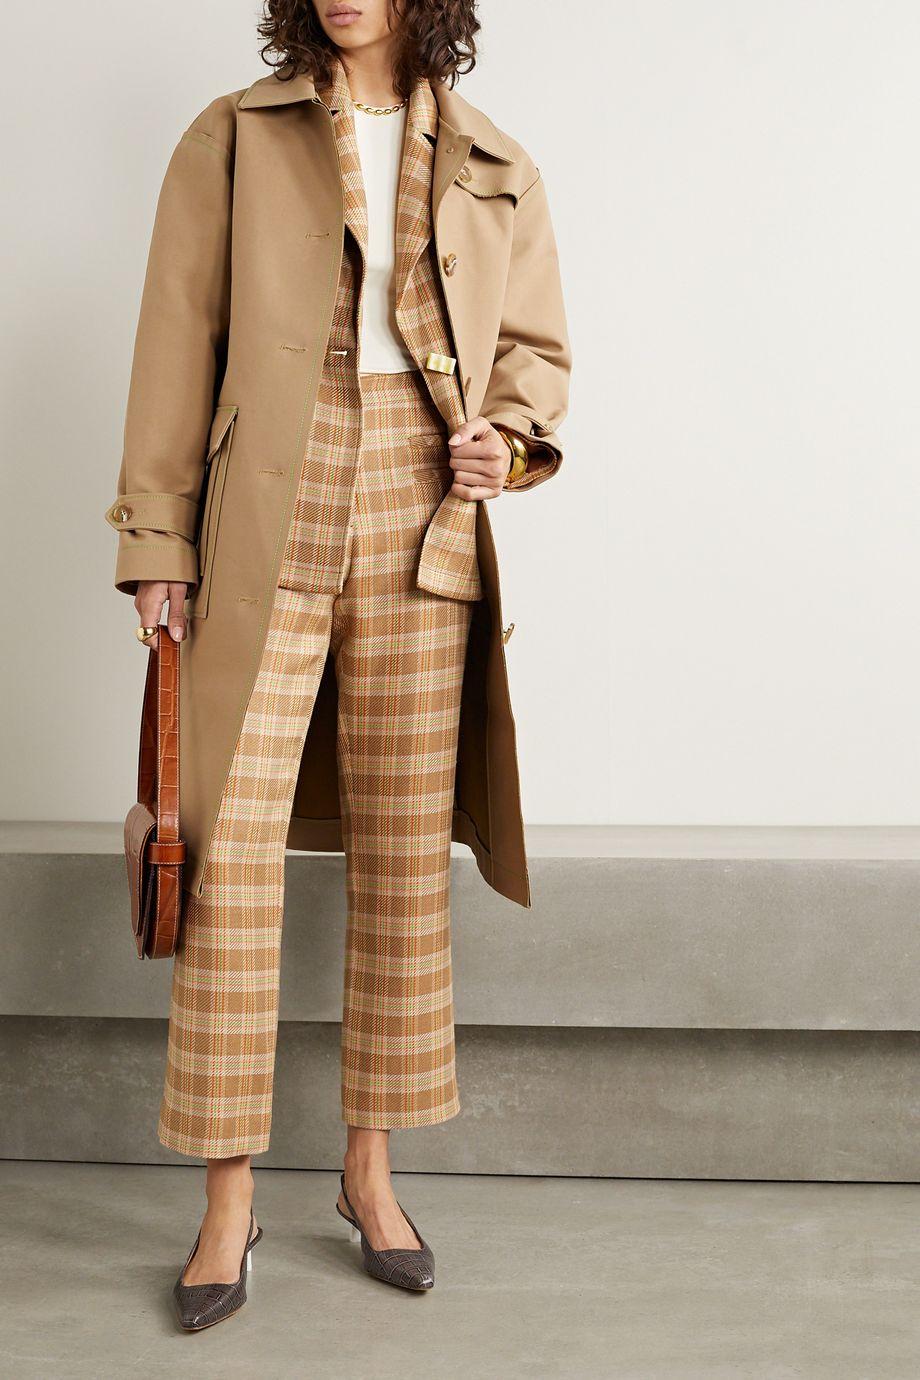 REJINA PYO Joanna cotton-gabardine trench coat